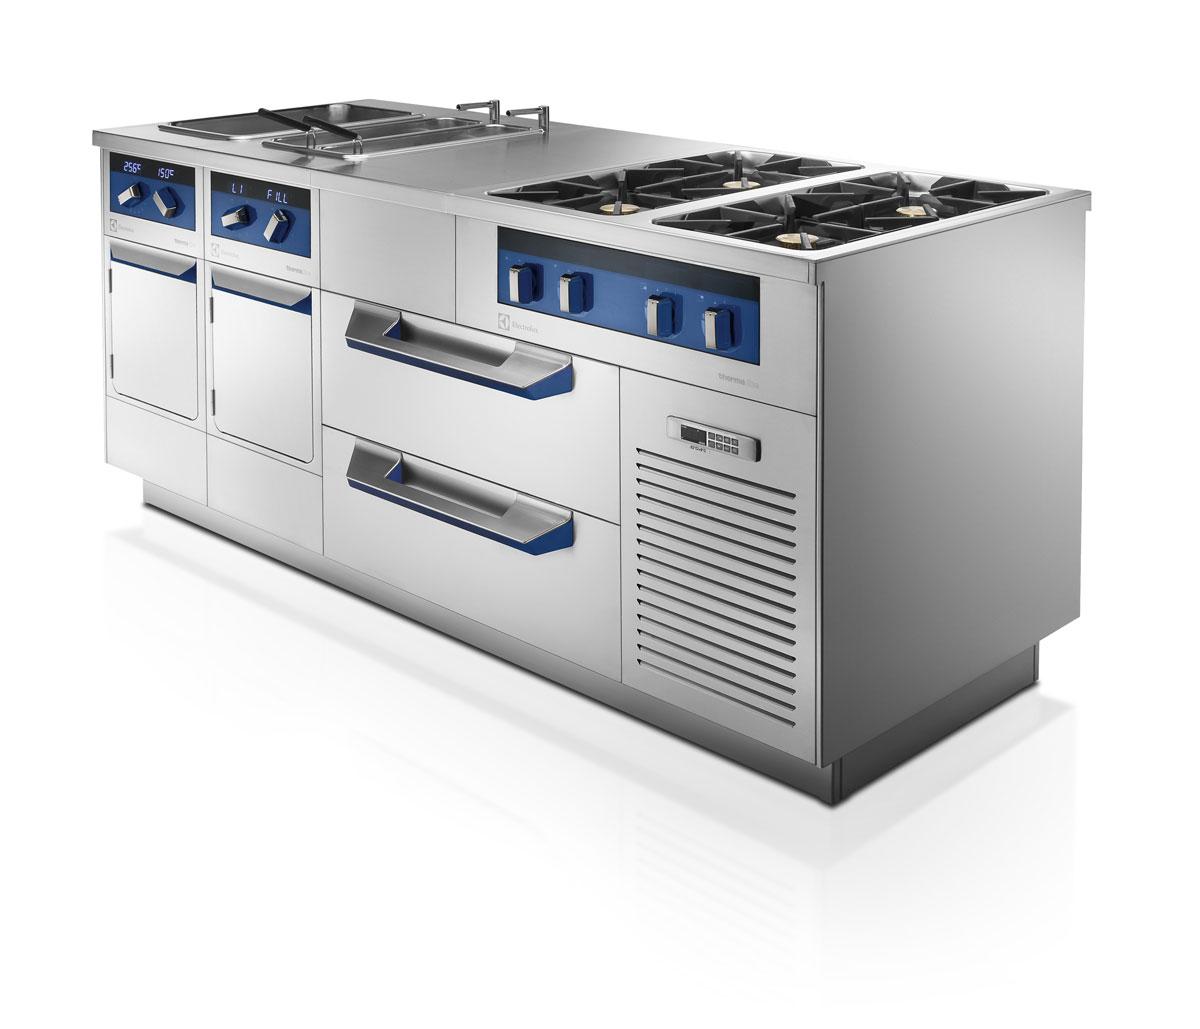 thermaline modular 80 & 90